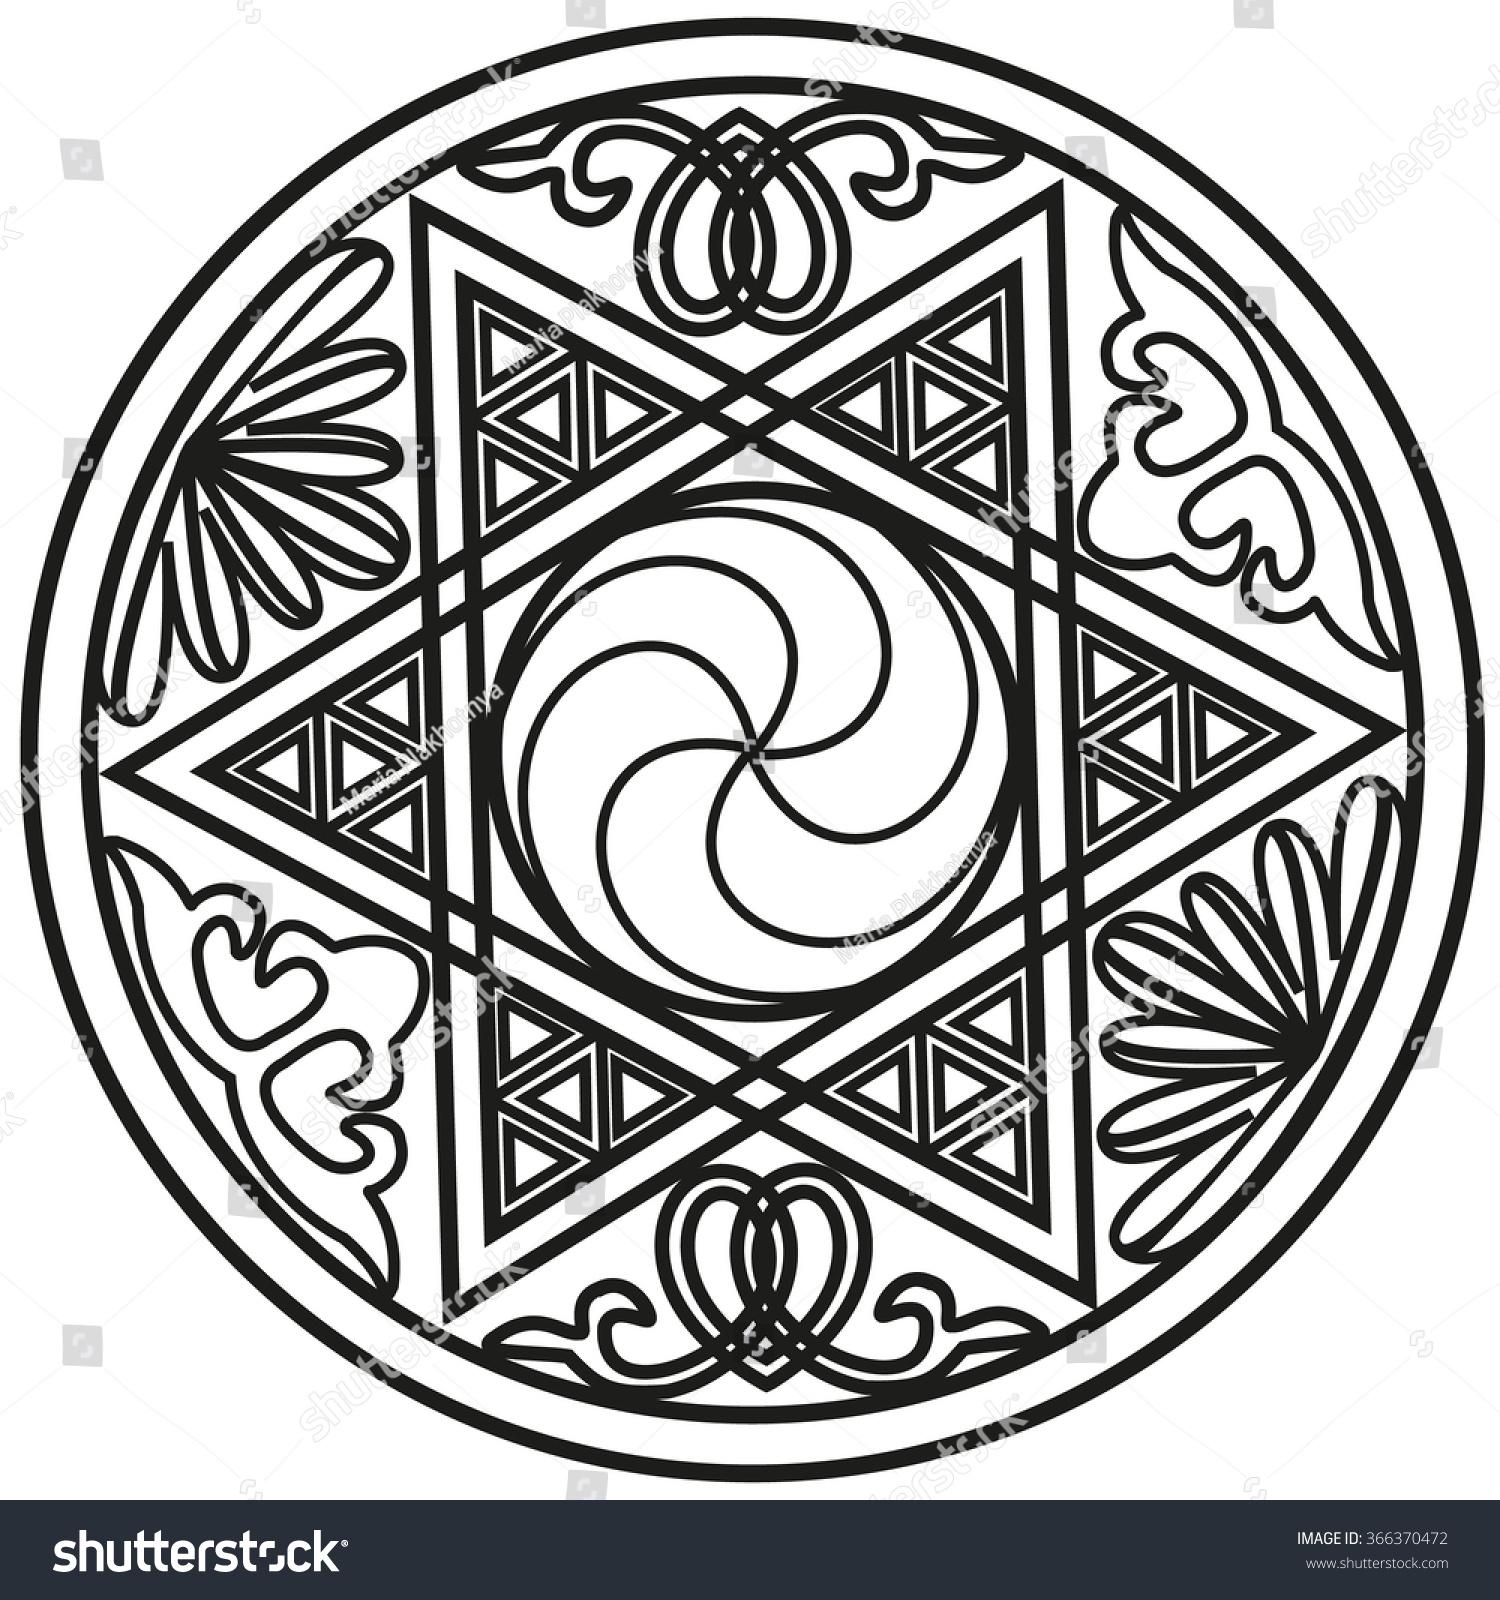 Jewish geometric ornament sacred geometry sign stock vector jewish geometric ornament sacred geometry sign abstract vector pattern mystic badge hexagon biocorpaavc Choice Image